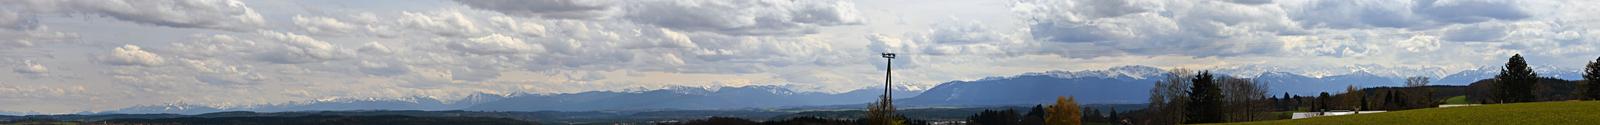 Alps panorama by Gamekiller48